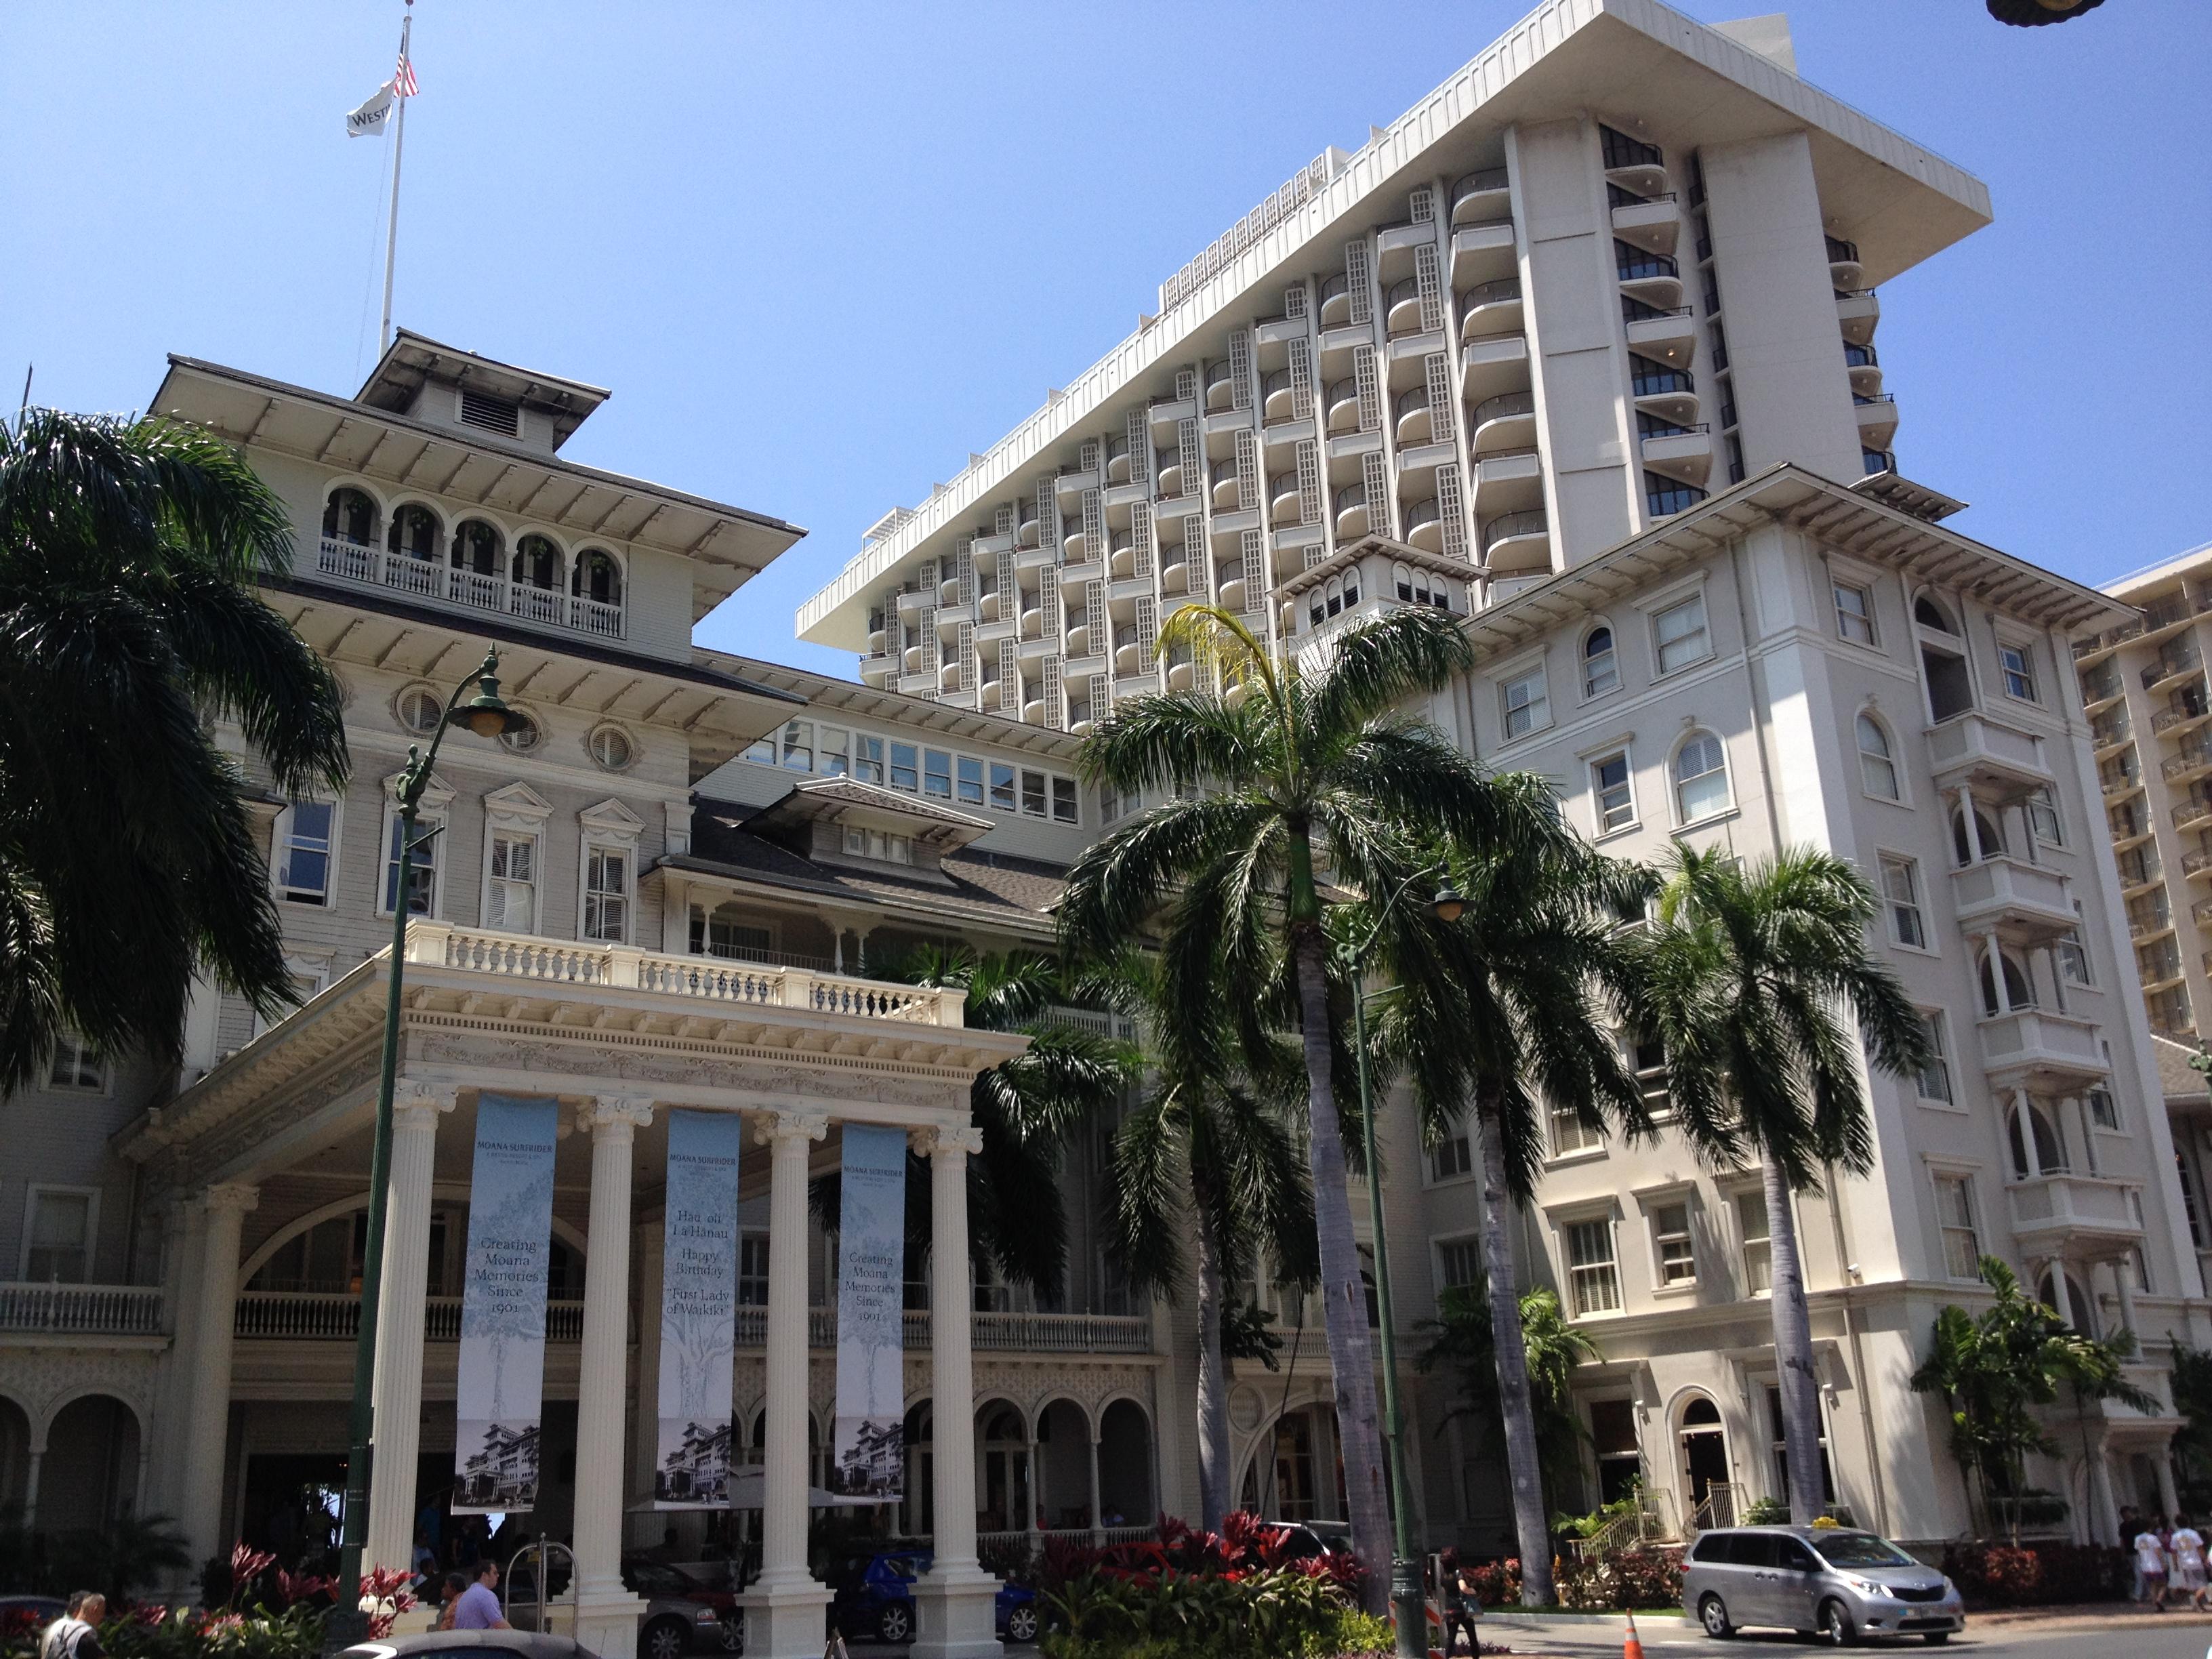 Best hotel in waikiki moana surfrider mar27 by keri · moana surfrider